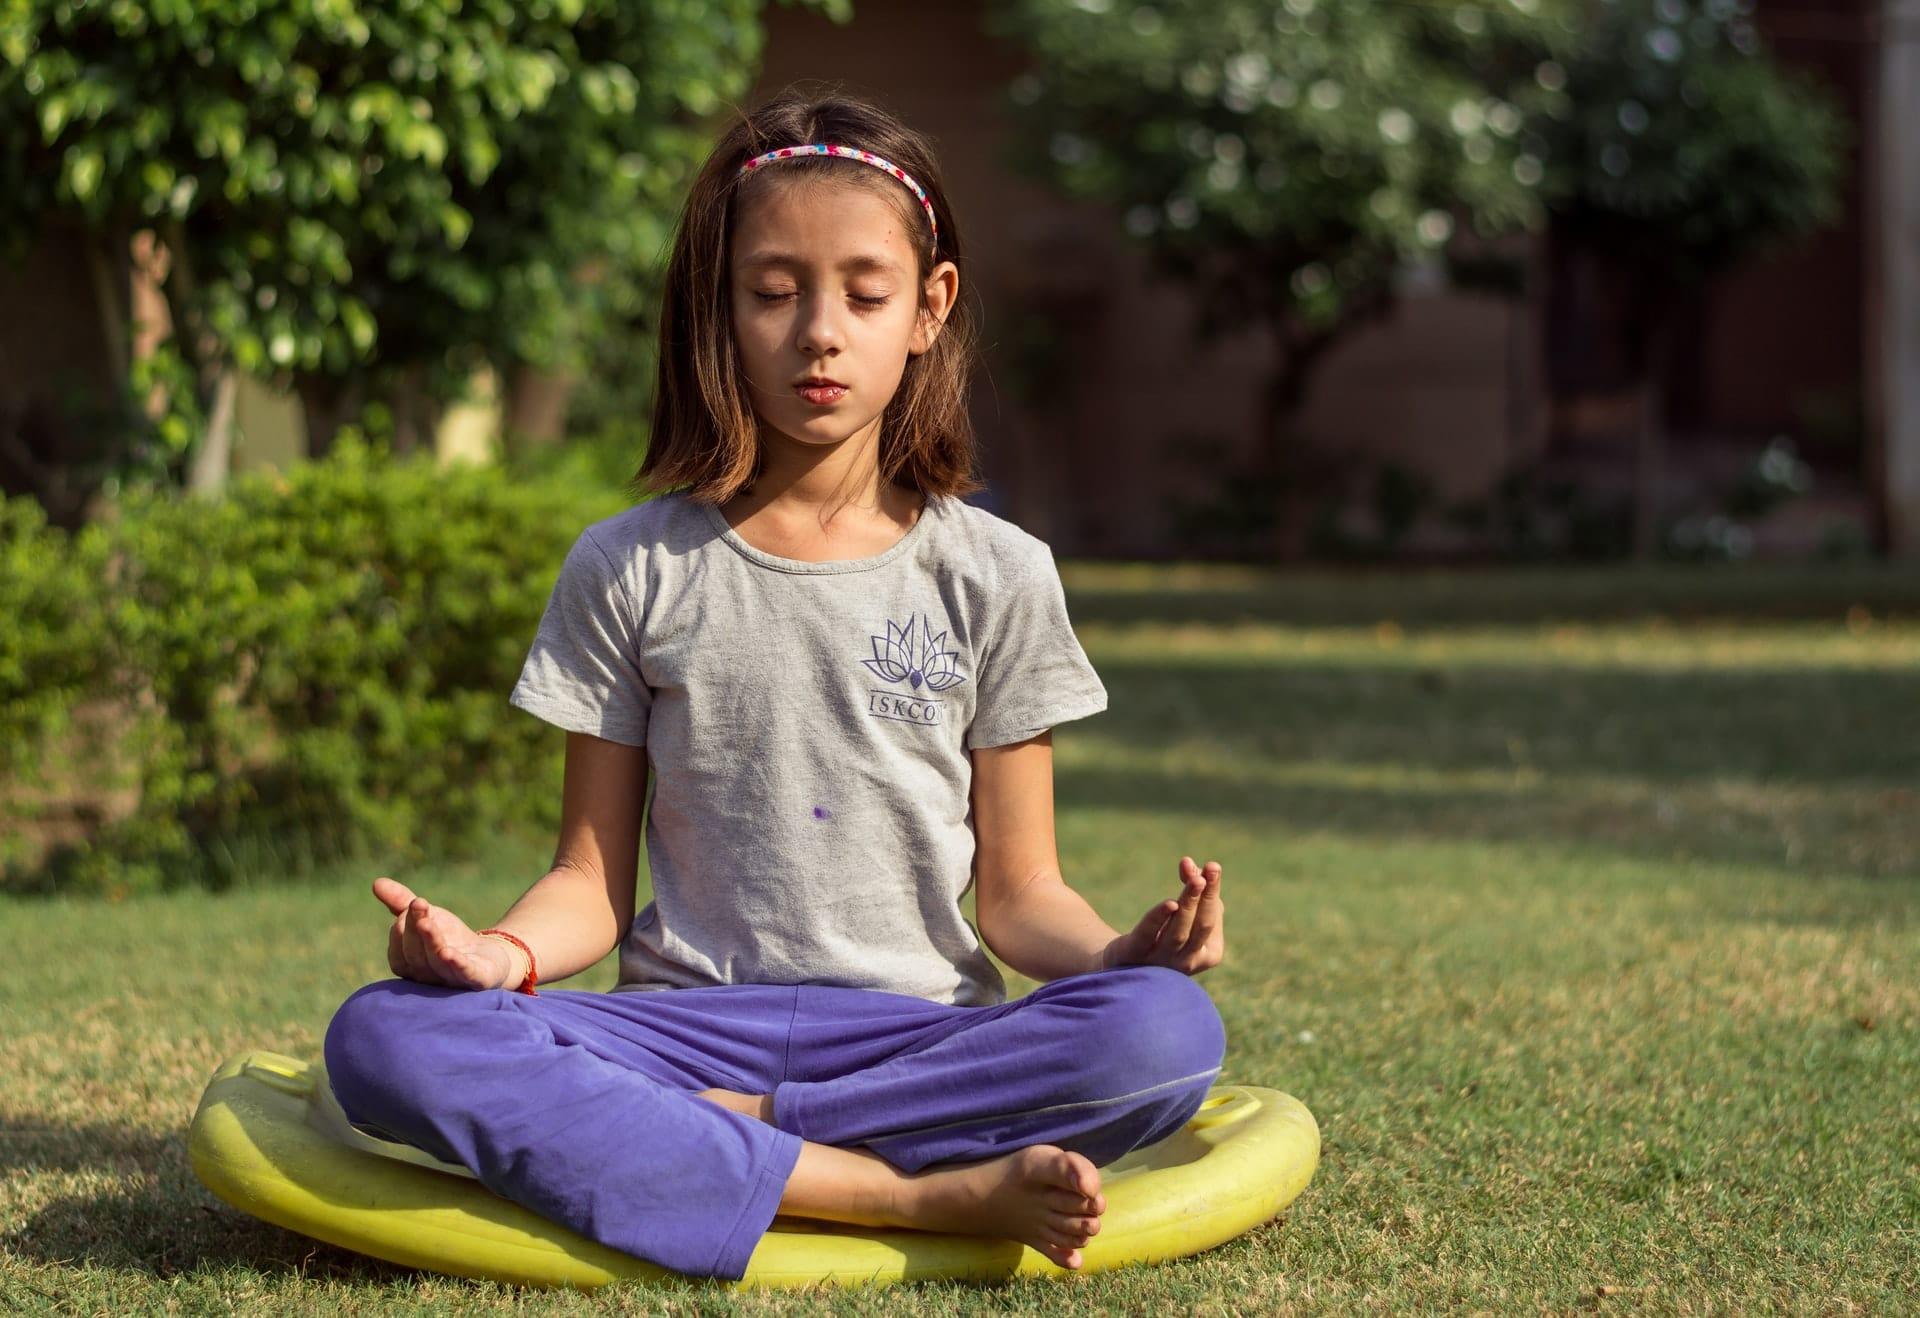 children yoga - Toddler Yoga and Yoga for Preschoolers